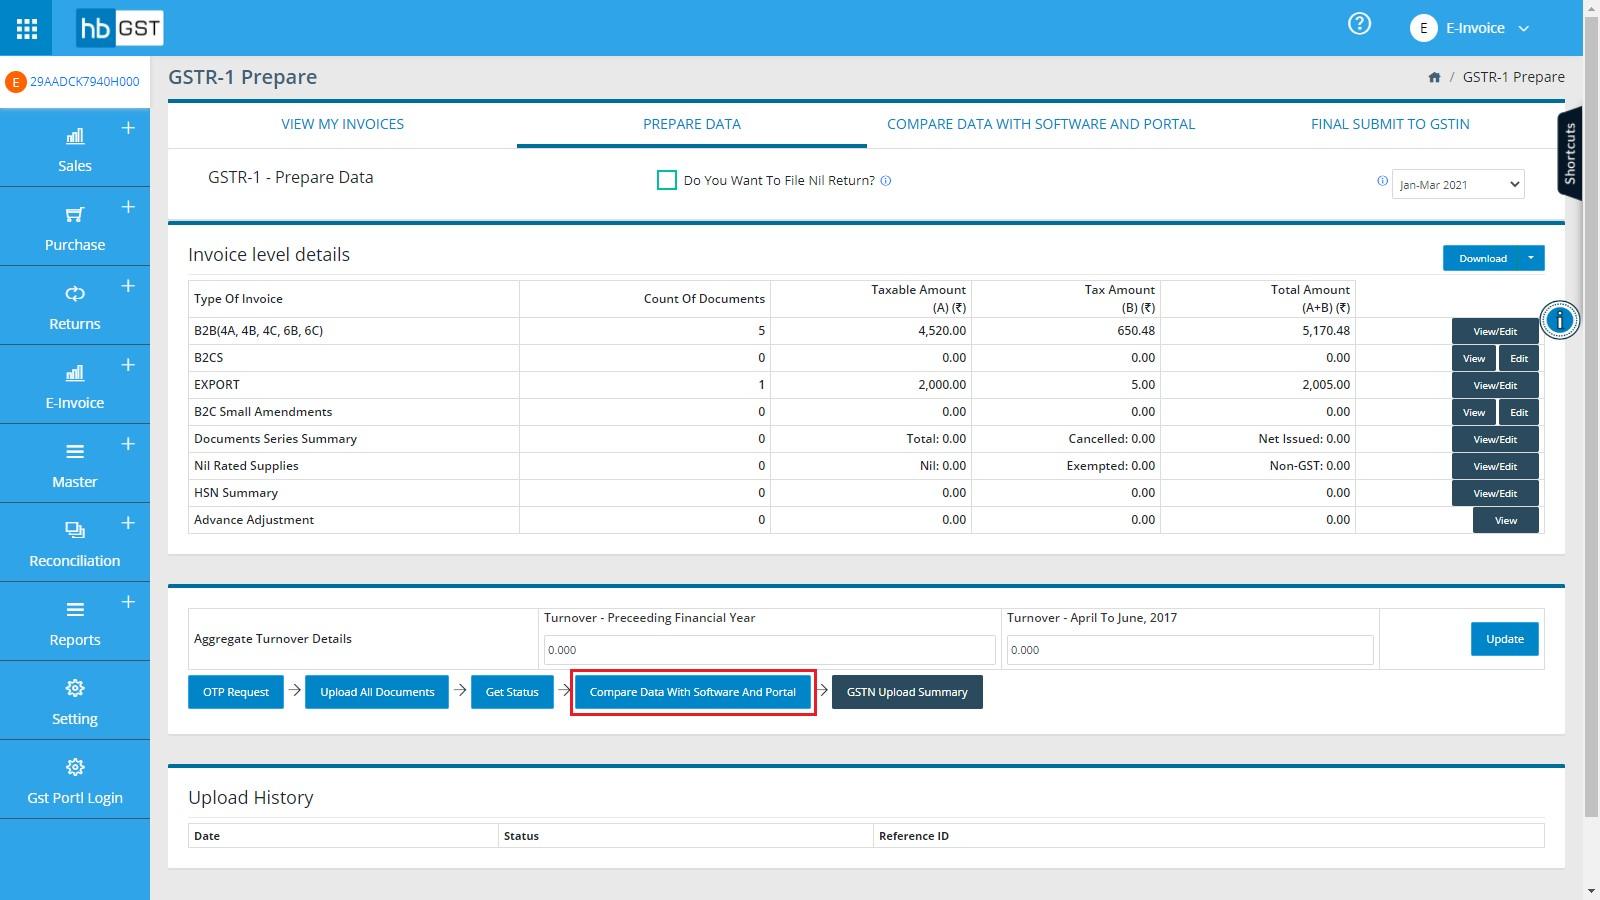 gstr-1-compare-data-software-with-portal-gstr-1